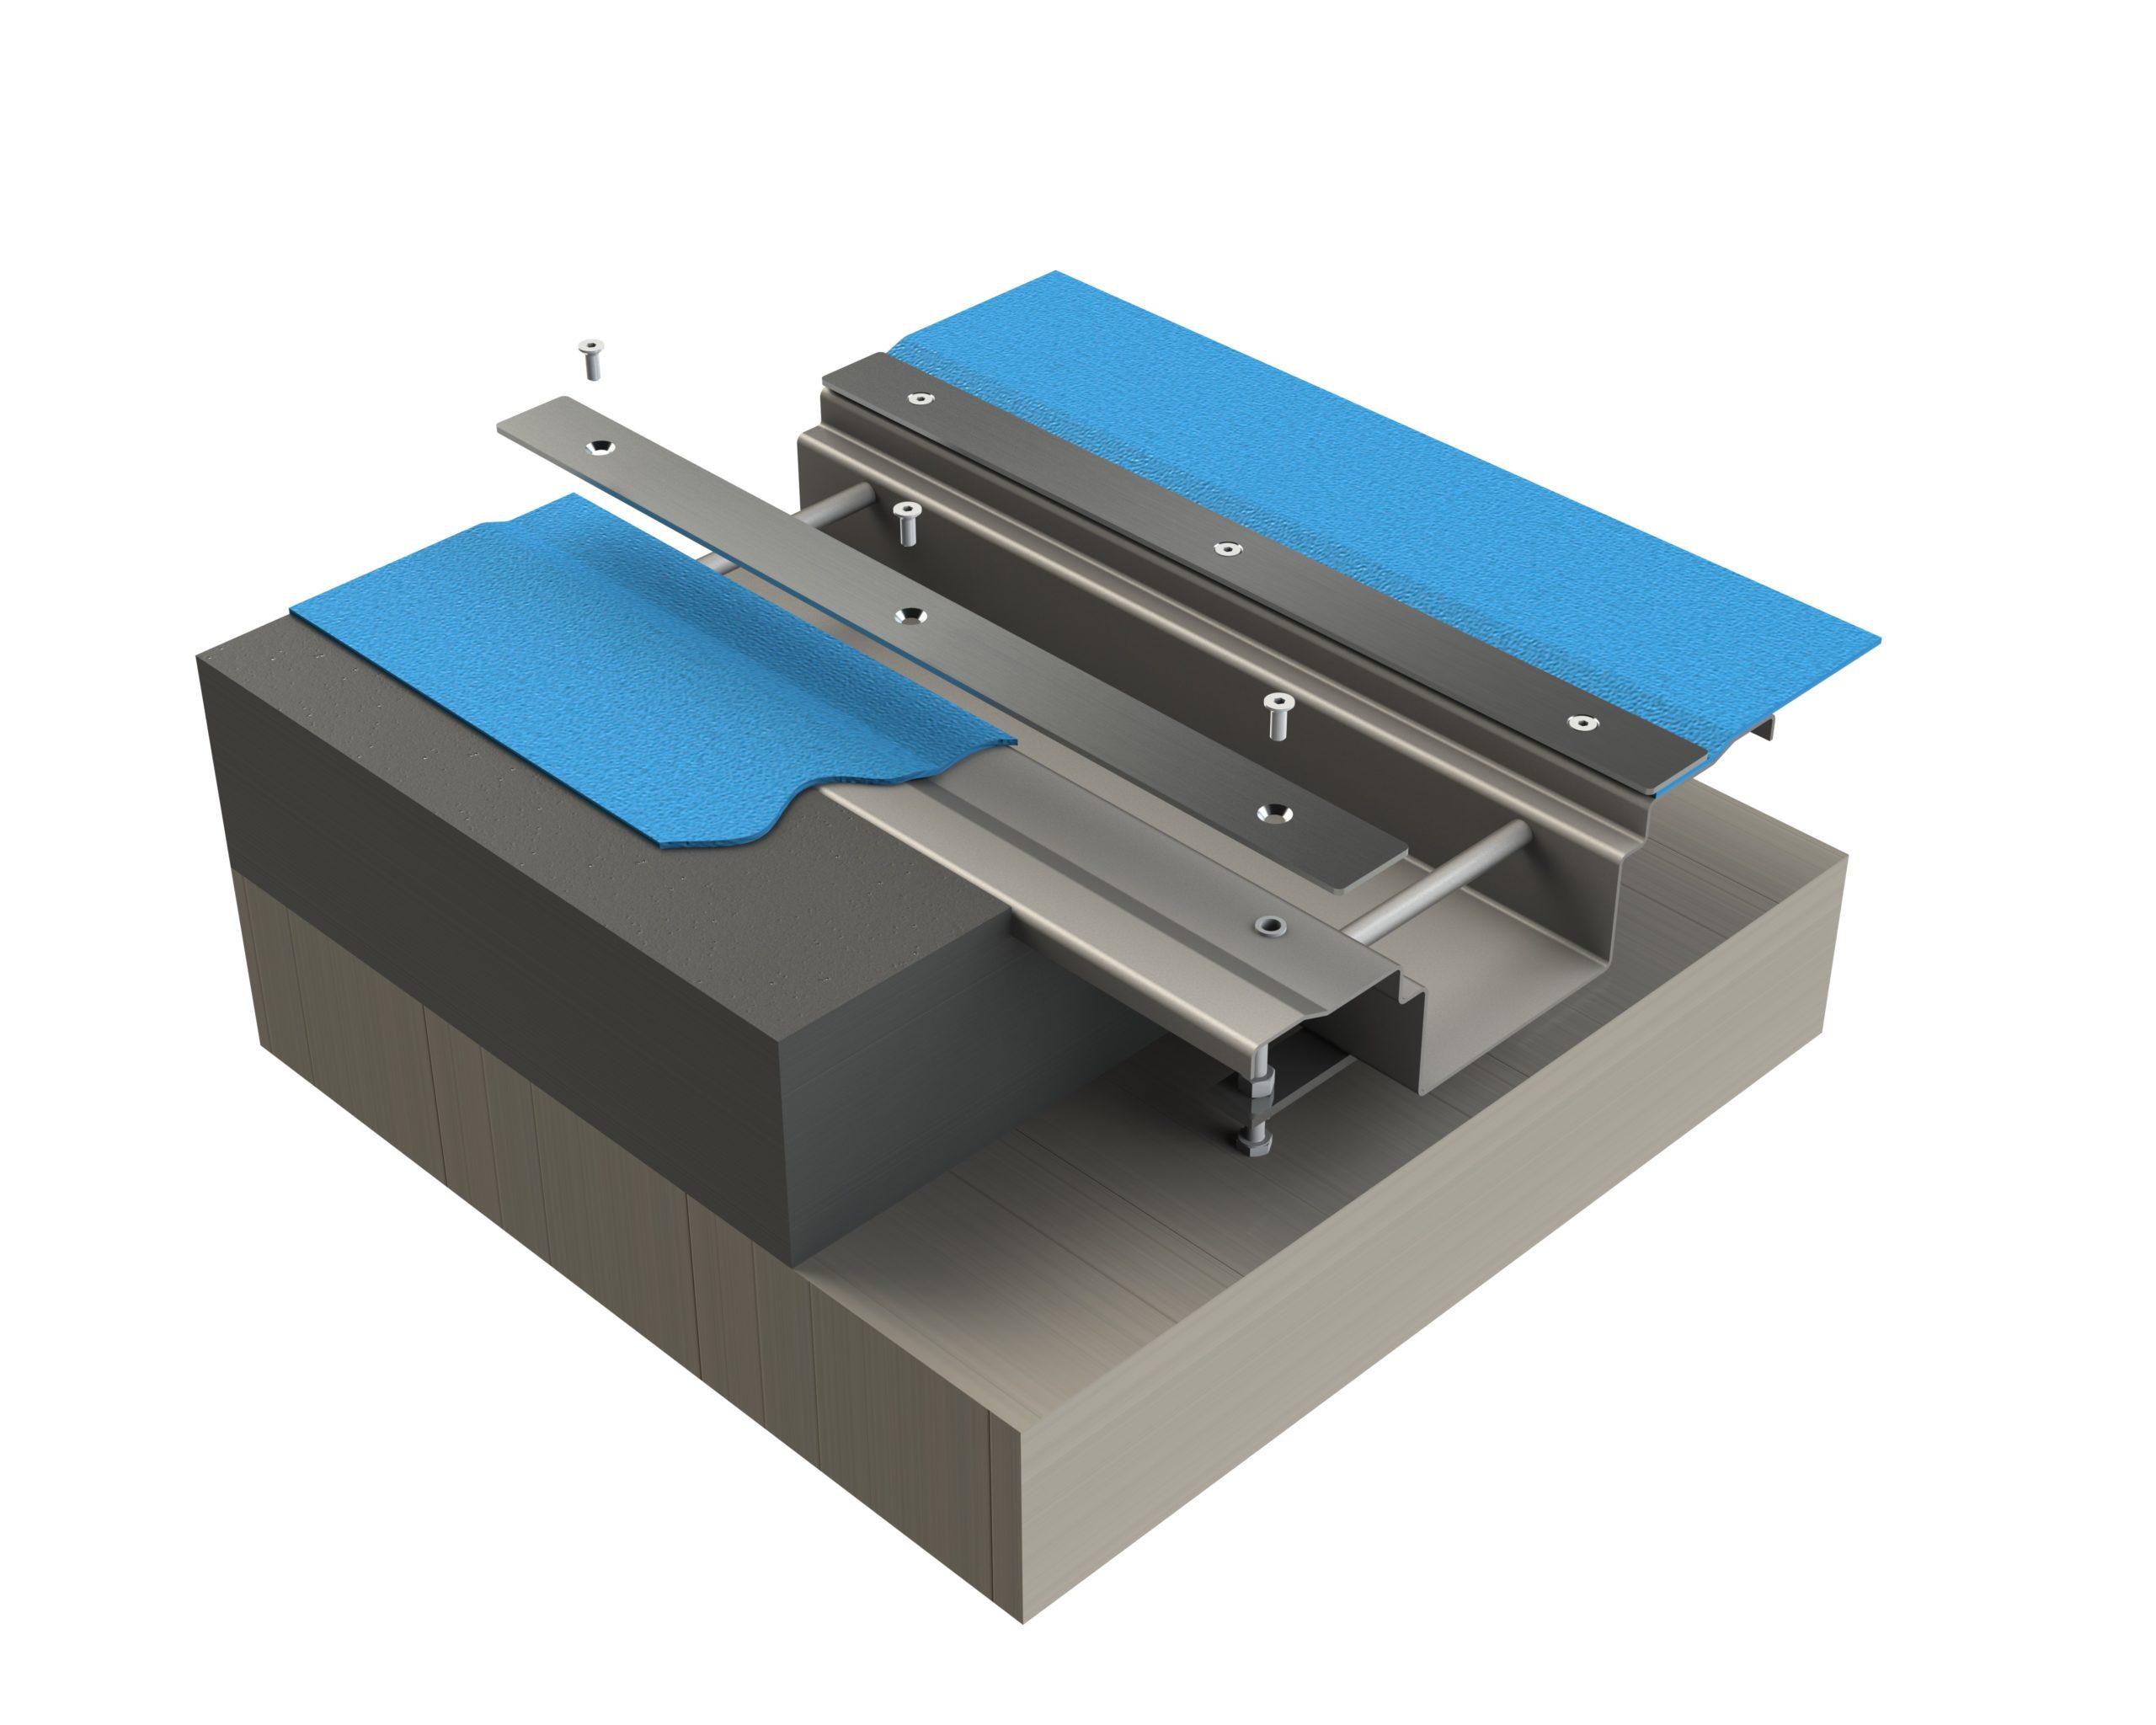 Model of Kents Vinyl box drain channel